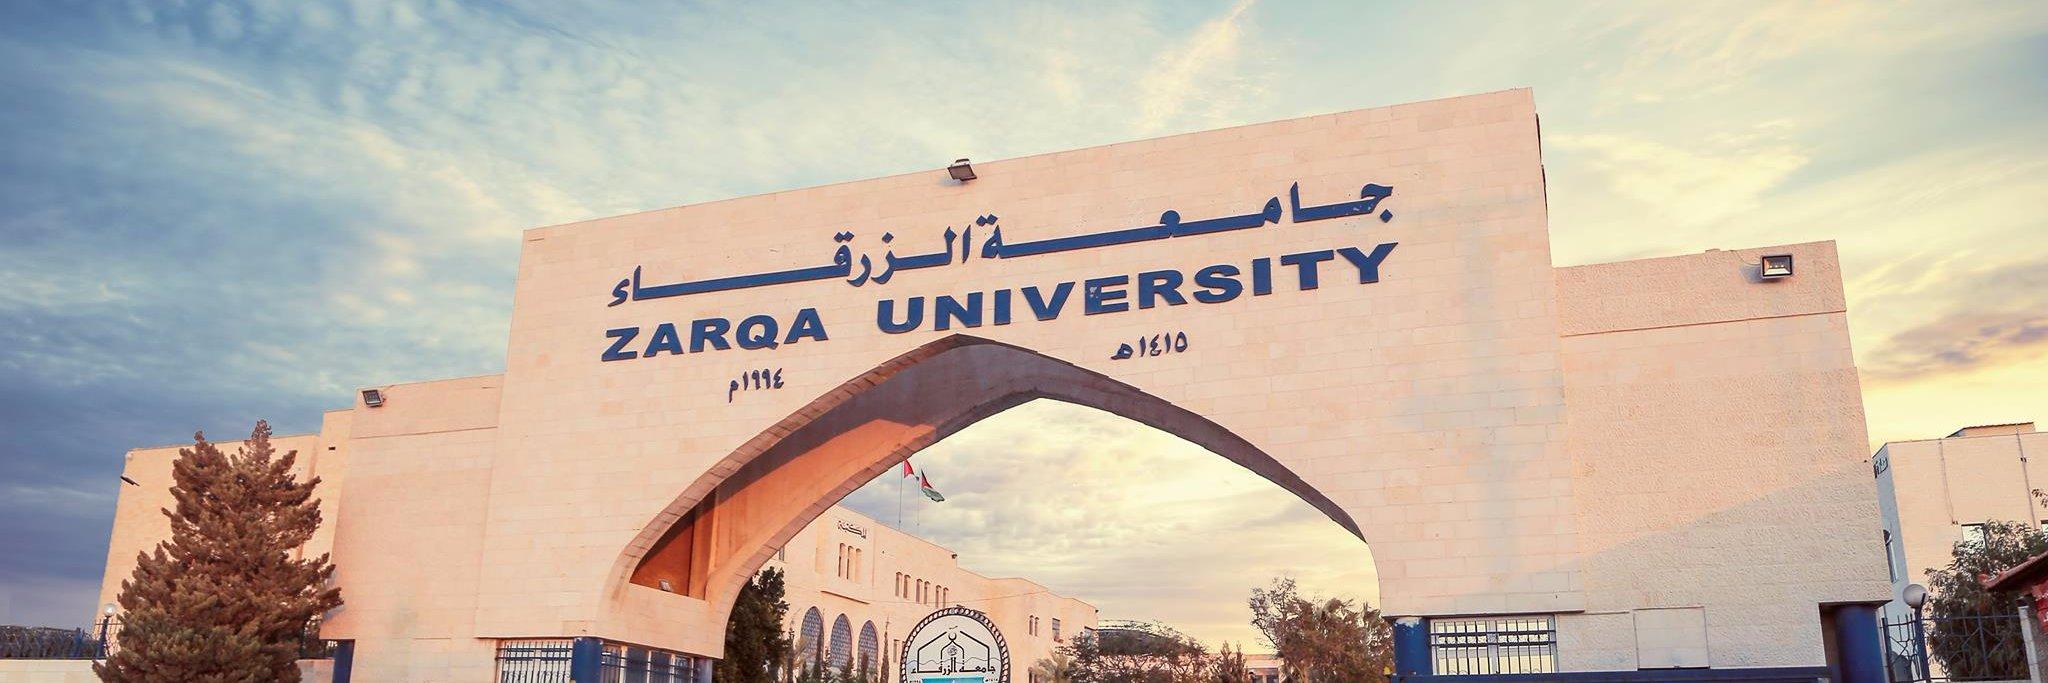 Zarqa University's official Twitter account